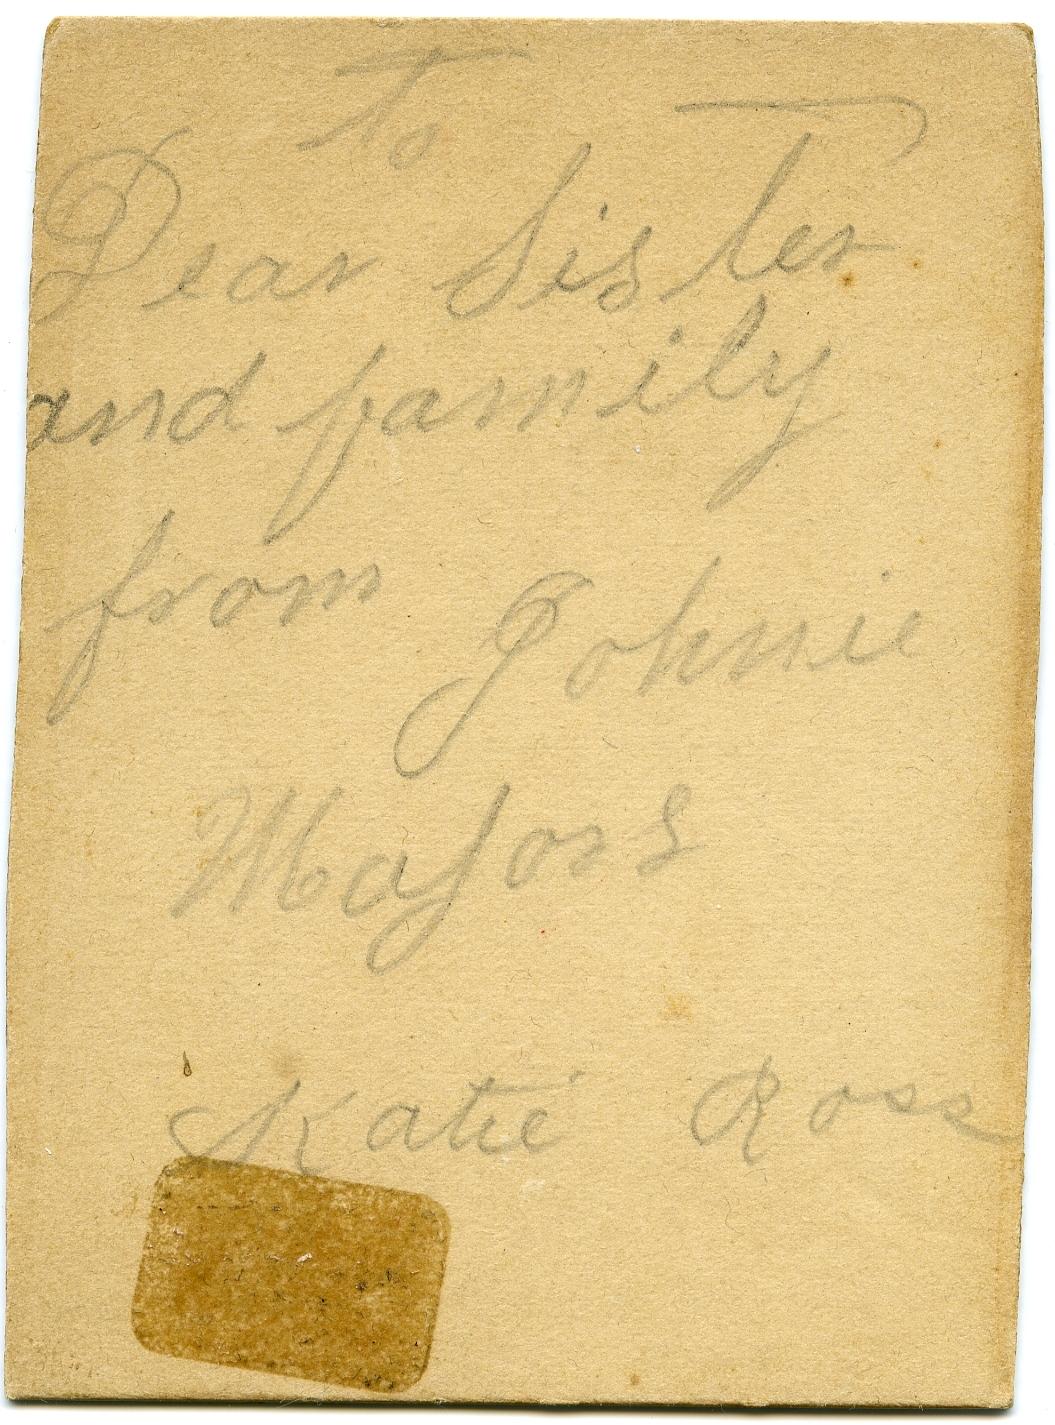 Johnie Majors